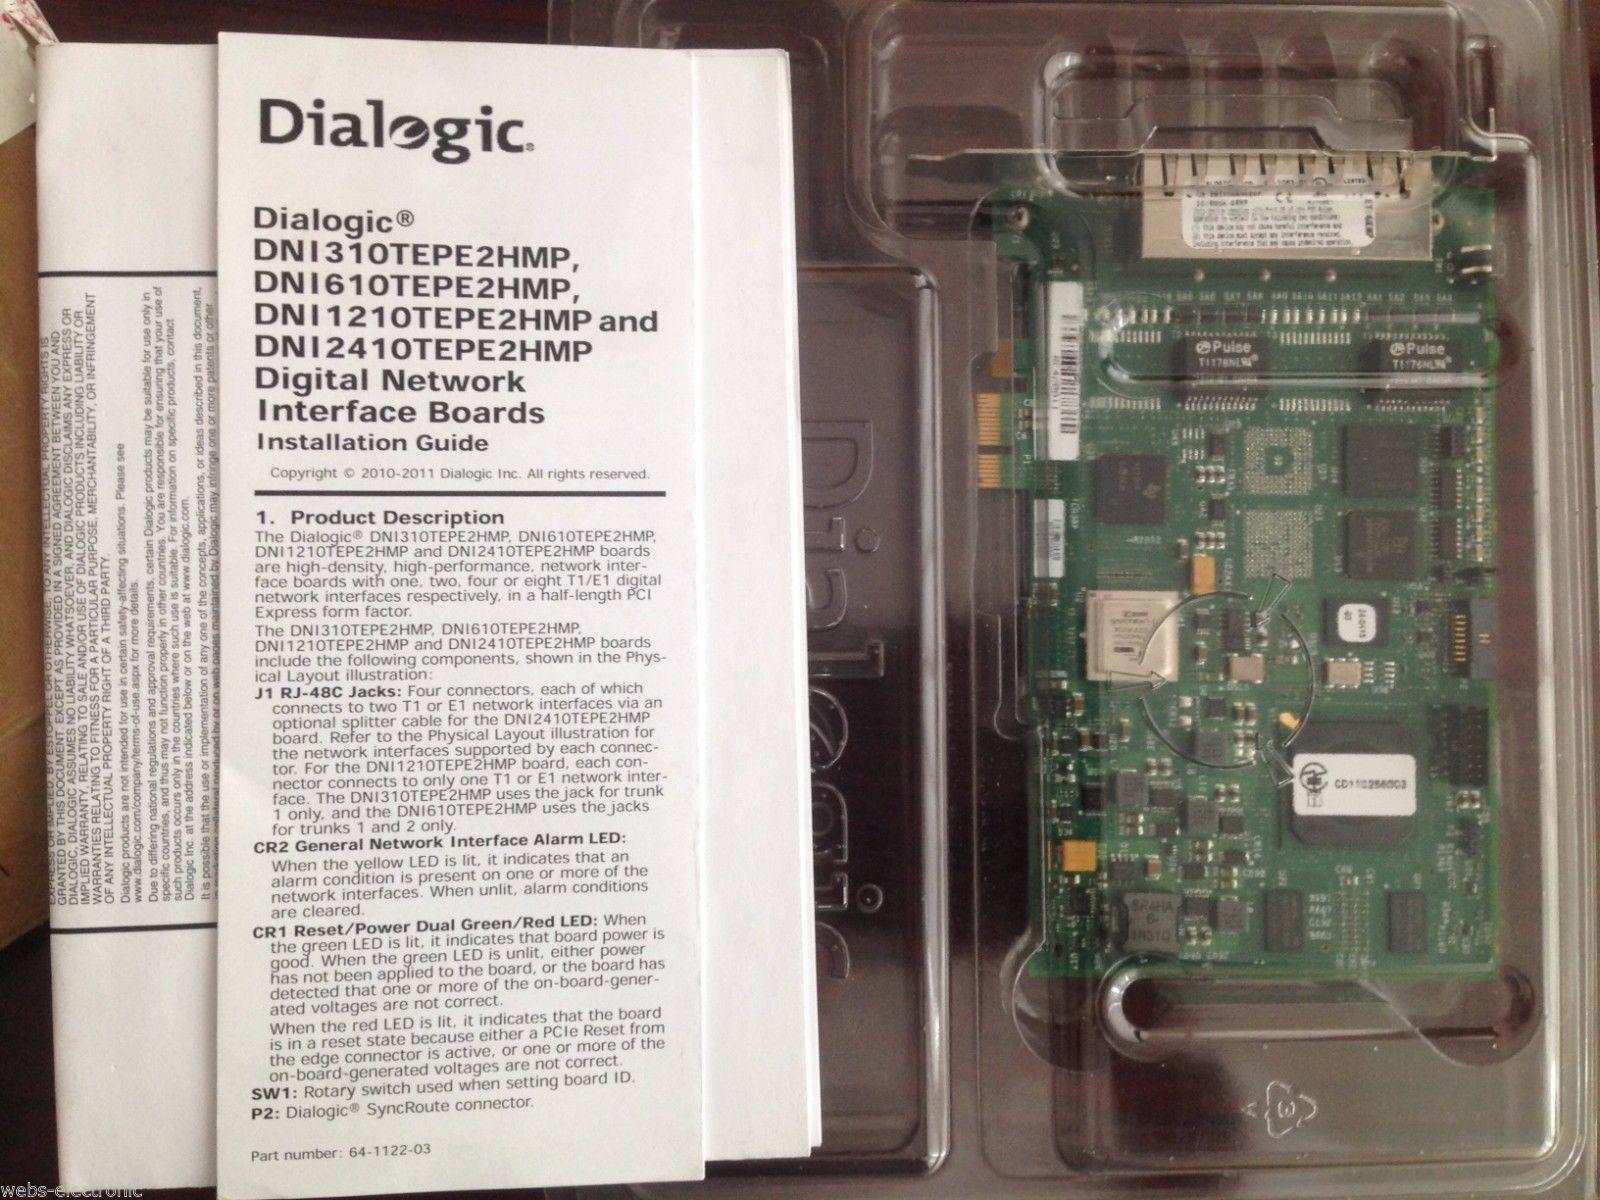 Dialogic 306-484-51 digital network interface board dni610tepe2hmp ebzxdnangemp